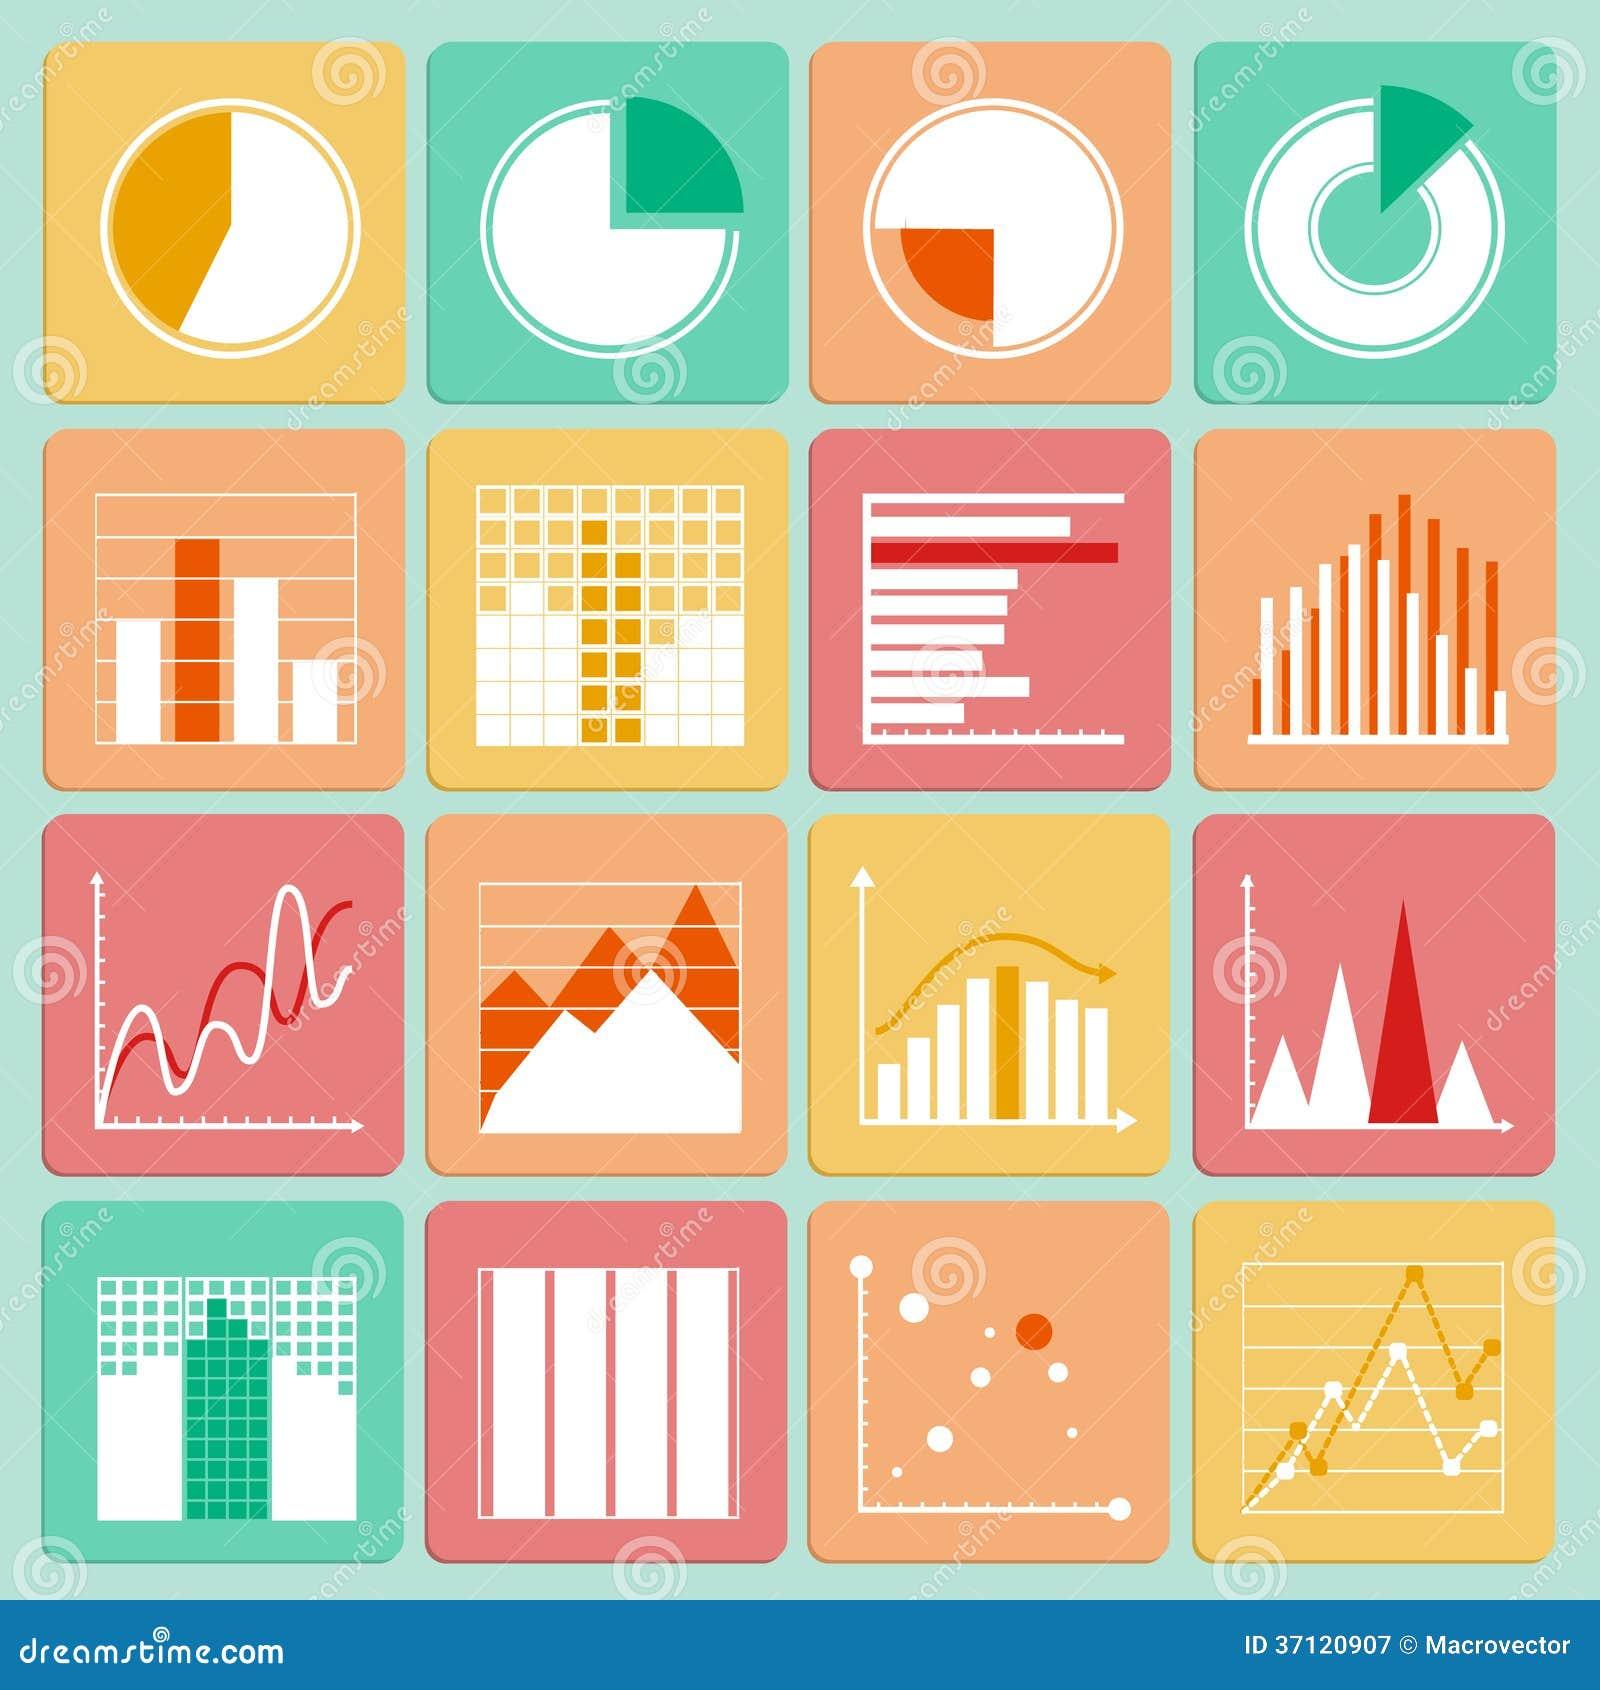 Presentation Business Icons